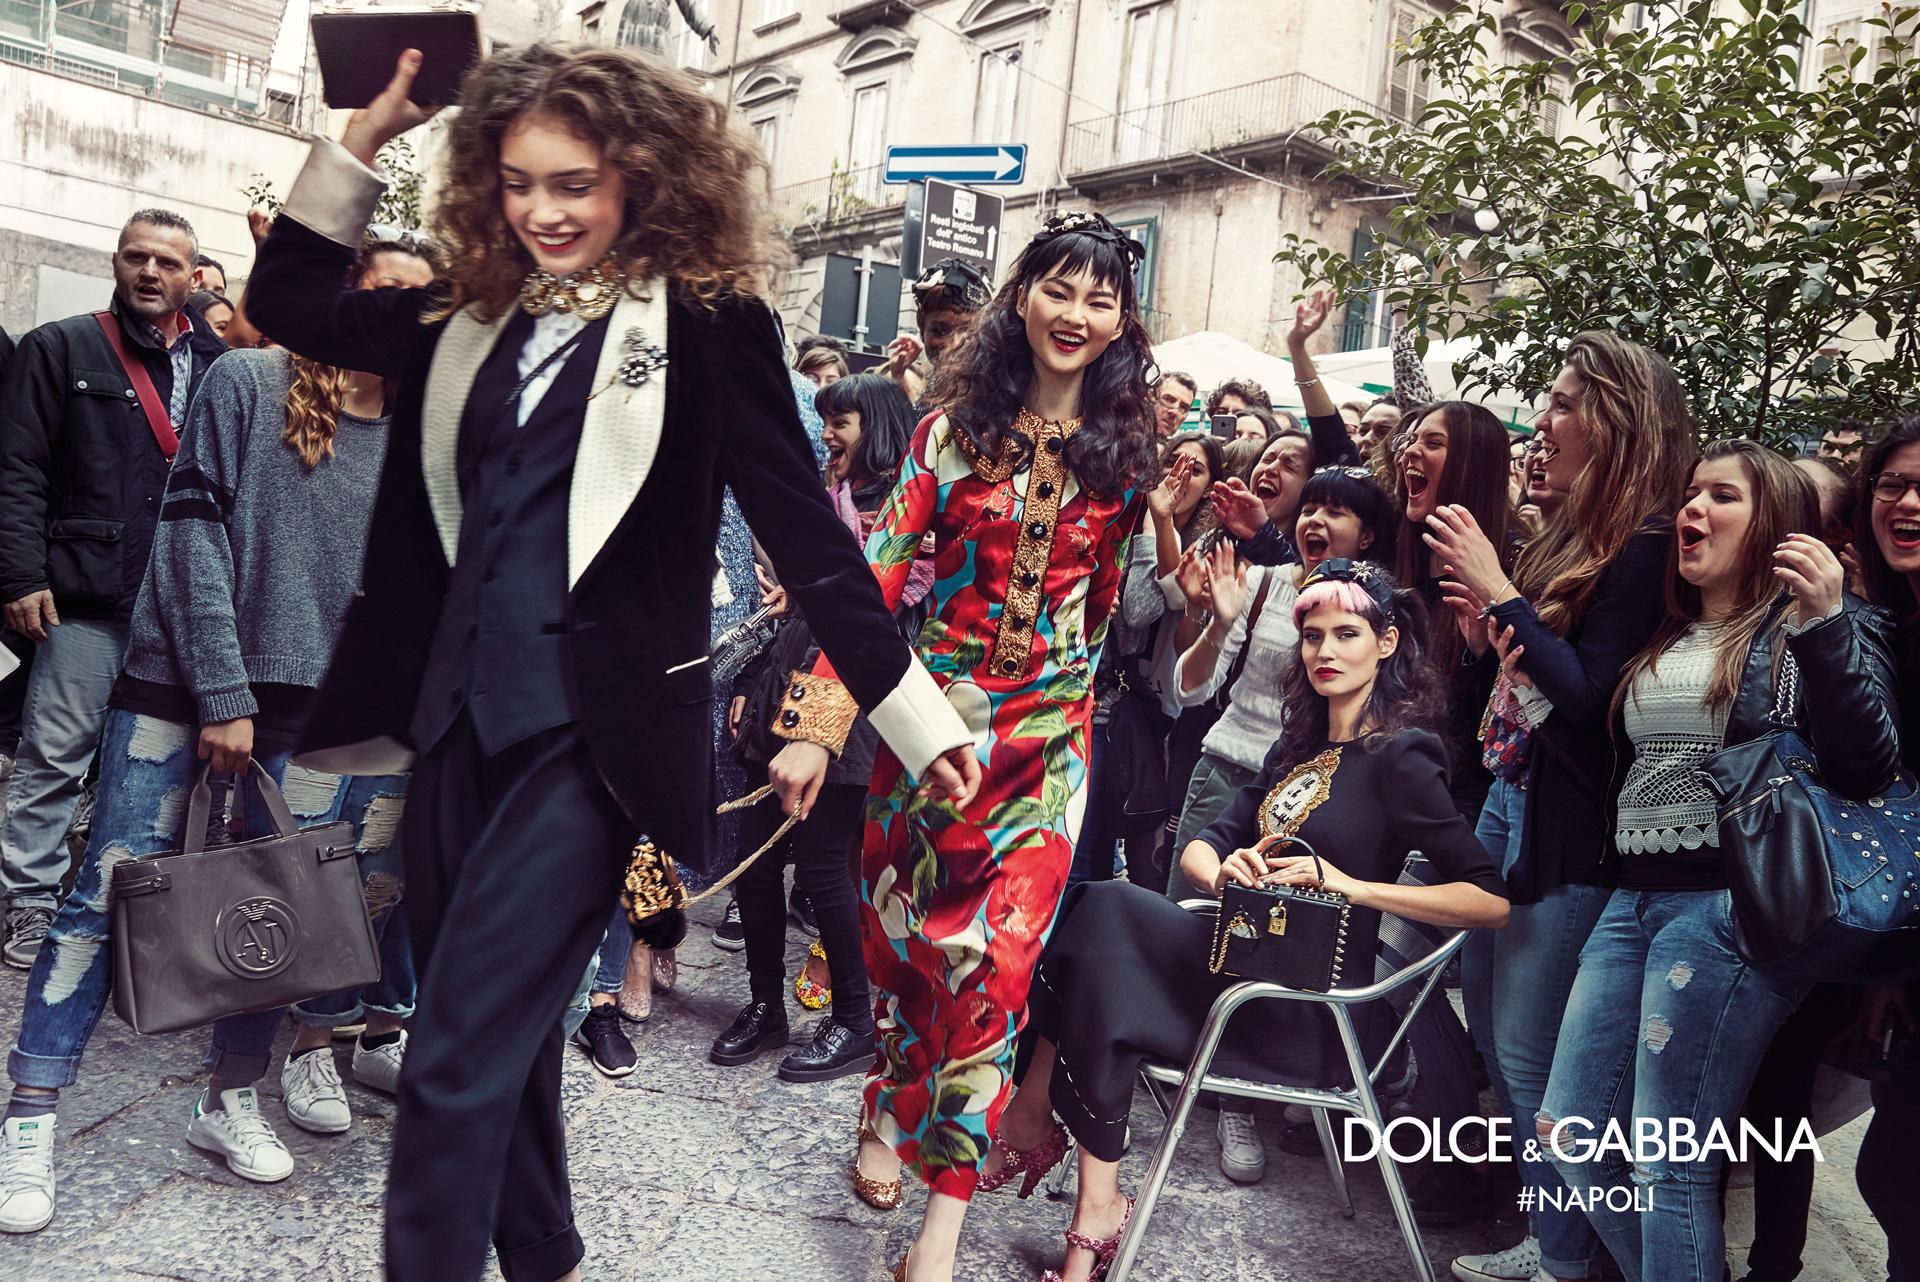 Dolce-Gabbana-Fall-Winter-2016-2017-Ad-Campaign-Naples-1